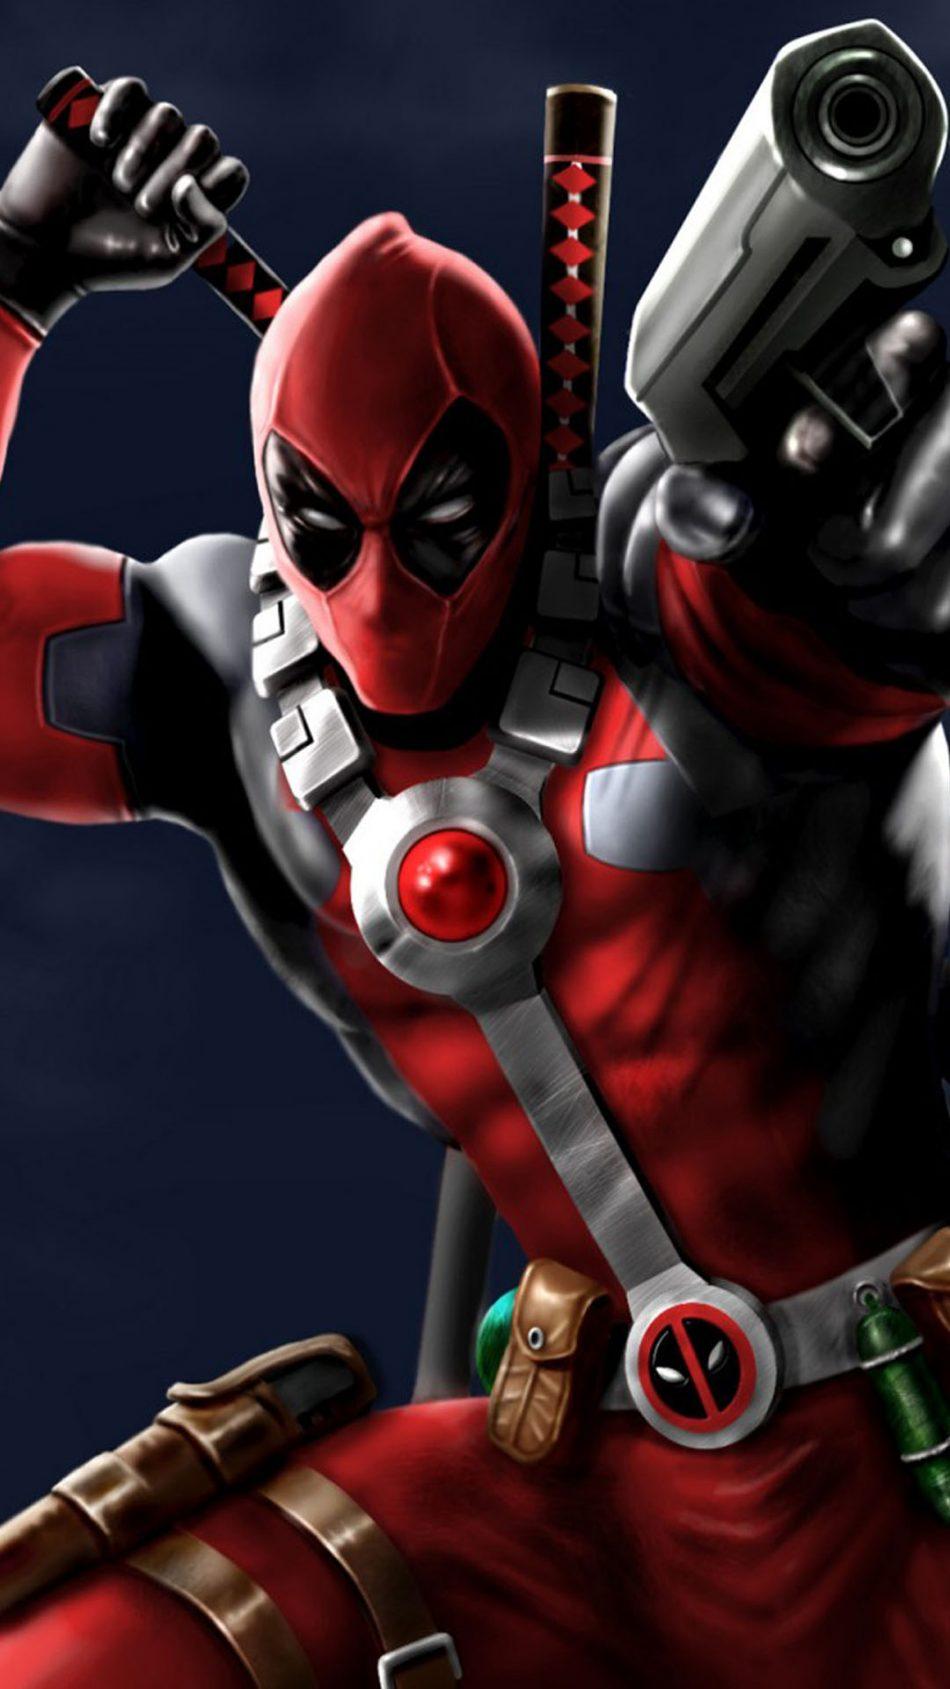 Deadpool 2 Digital Paint Hd Mobile Wallpaper 950x1689 Download Hd Wallpaper Wallpapertip